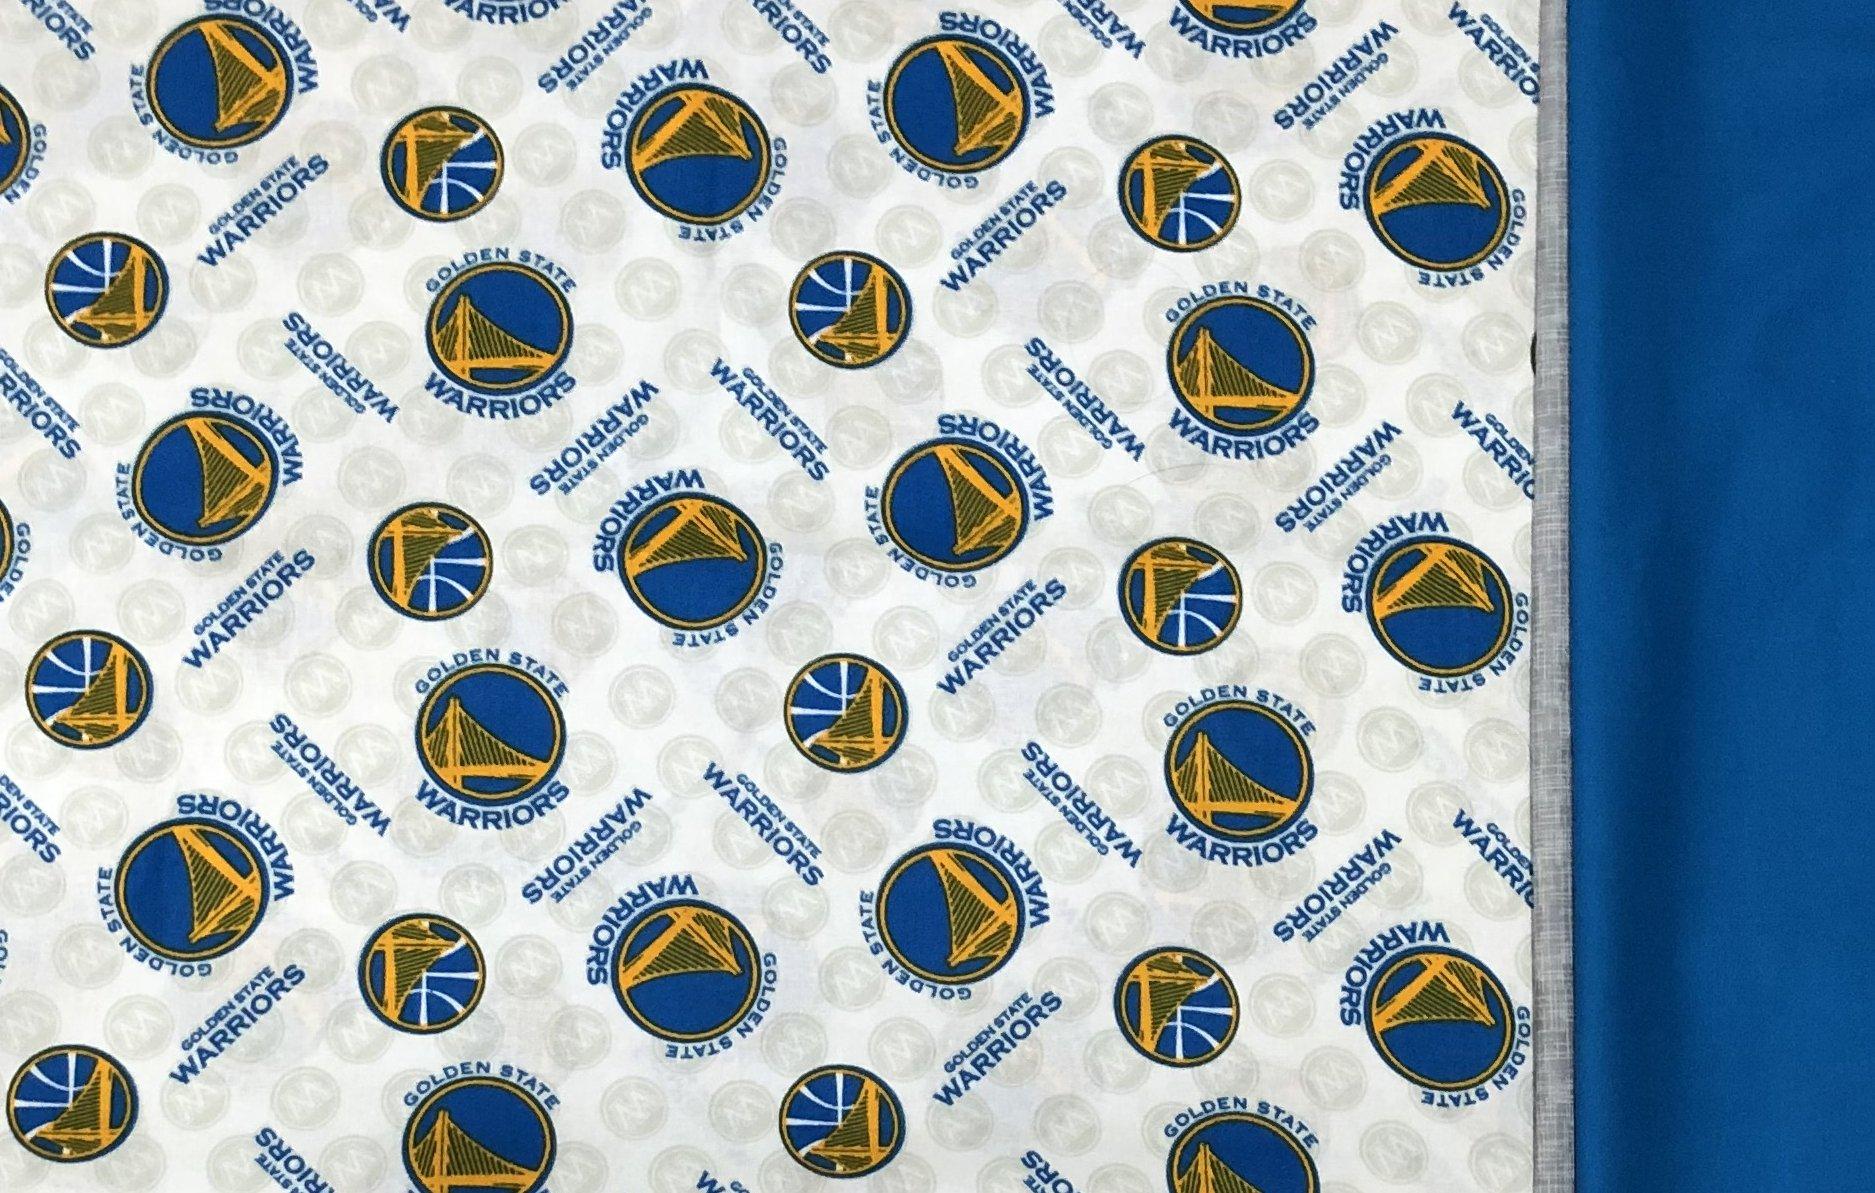 Pillowcase Kit - Golden State Warriors - Tube/Burrito-style